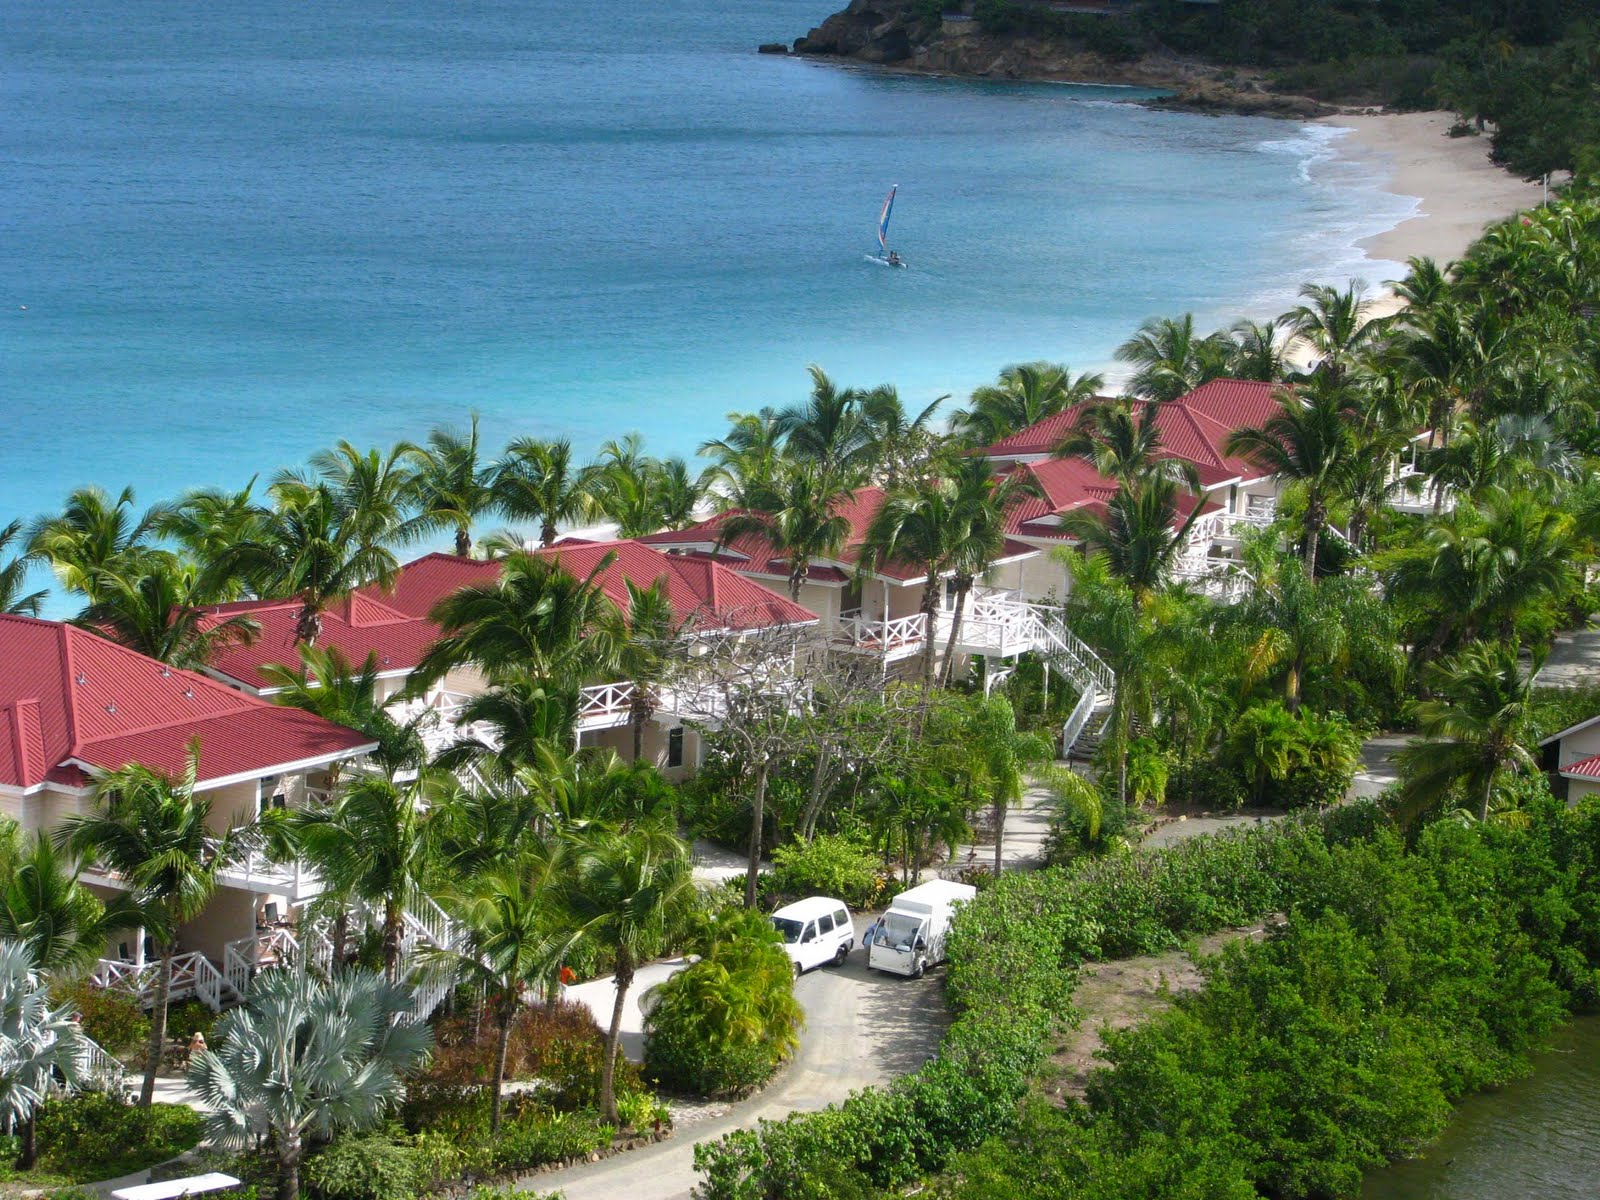 Antigua – El Gran Destino del Caribe